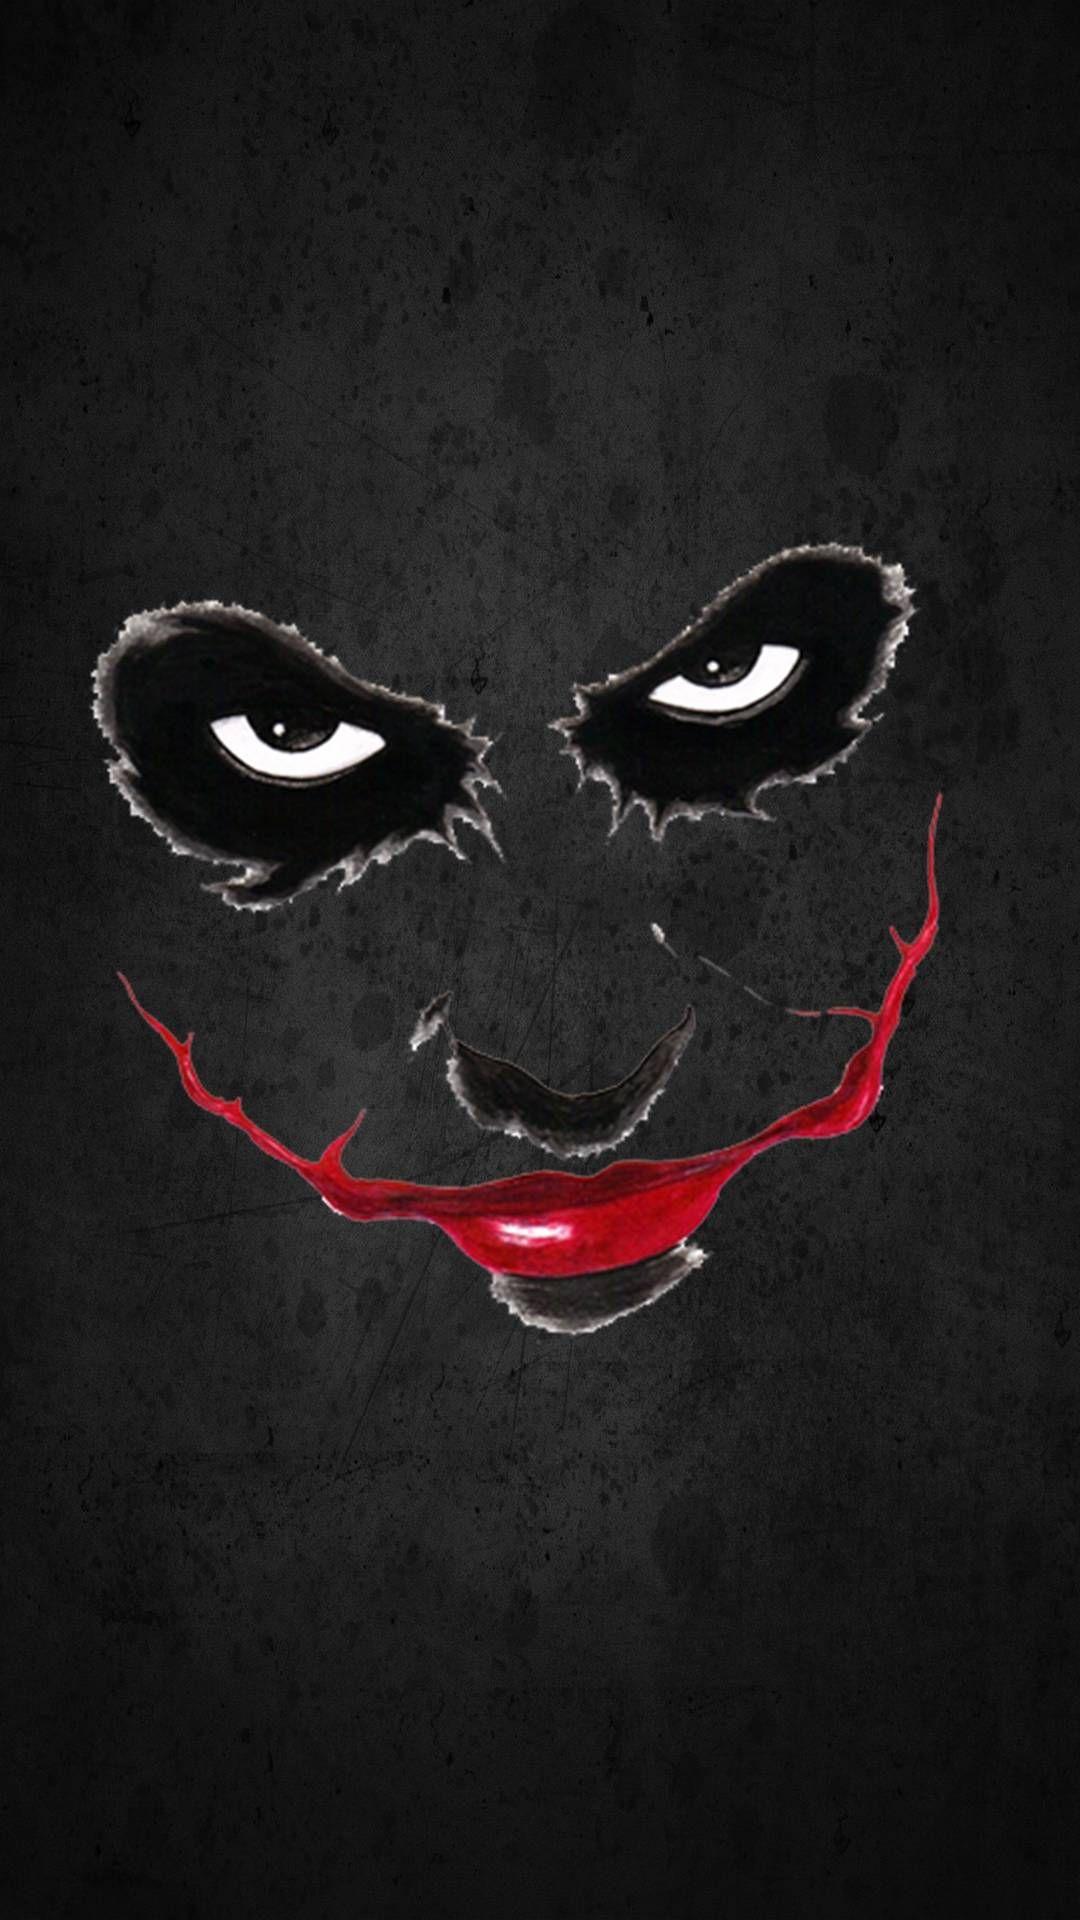 MuchaTseBle | Joker wallpapers, Joker hd wallpaper, Batman ...